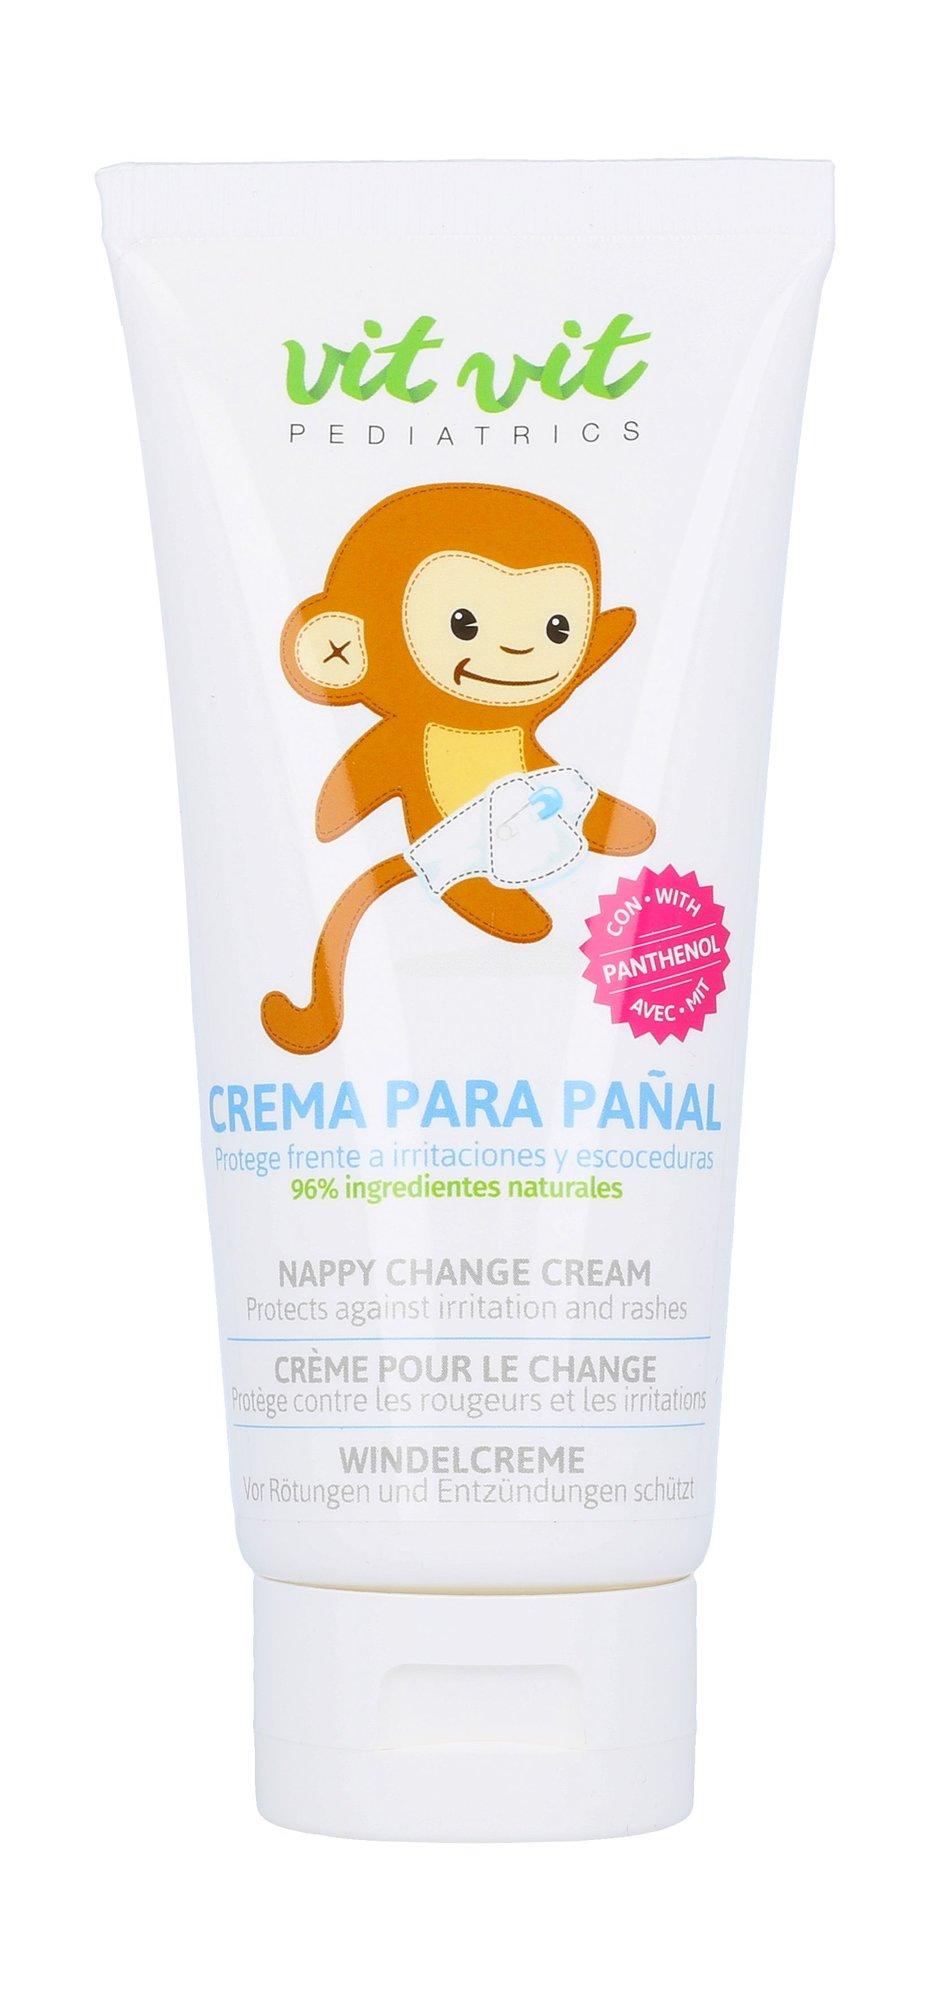 Diet Esthetic Vit Vit Pediatrics Nappy Change Cream Cosmetic 100ml